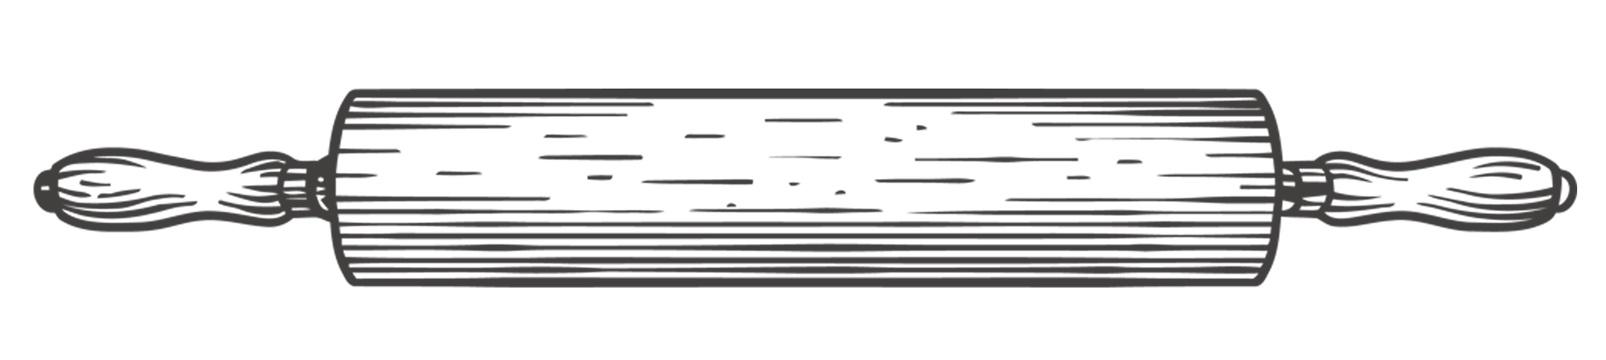 Rolling-Pin.jpg